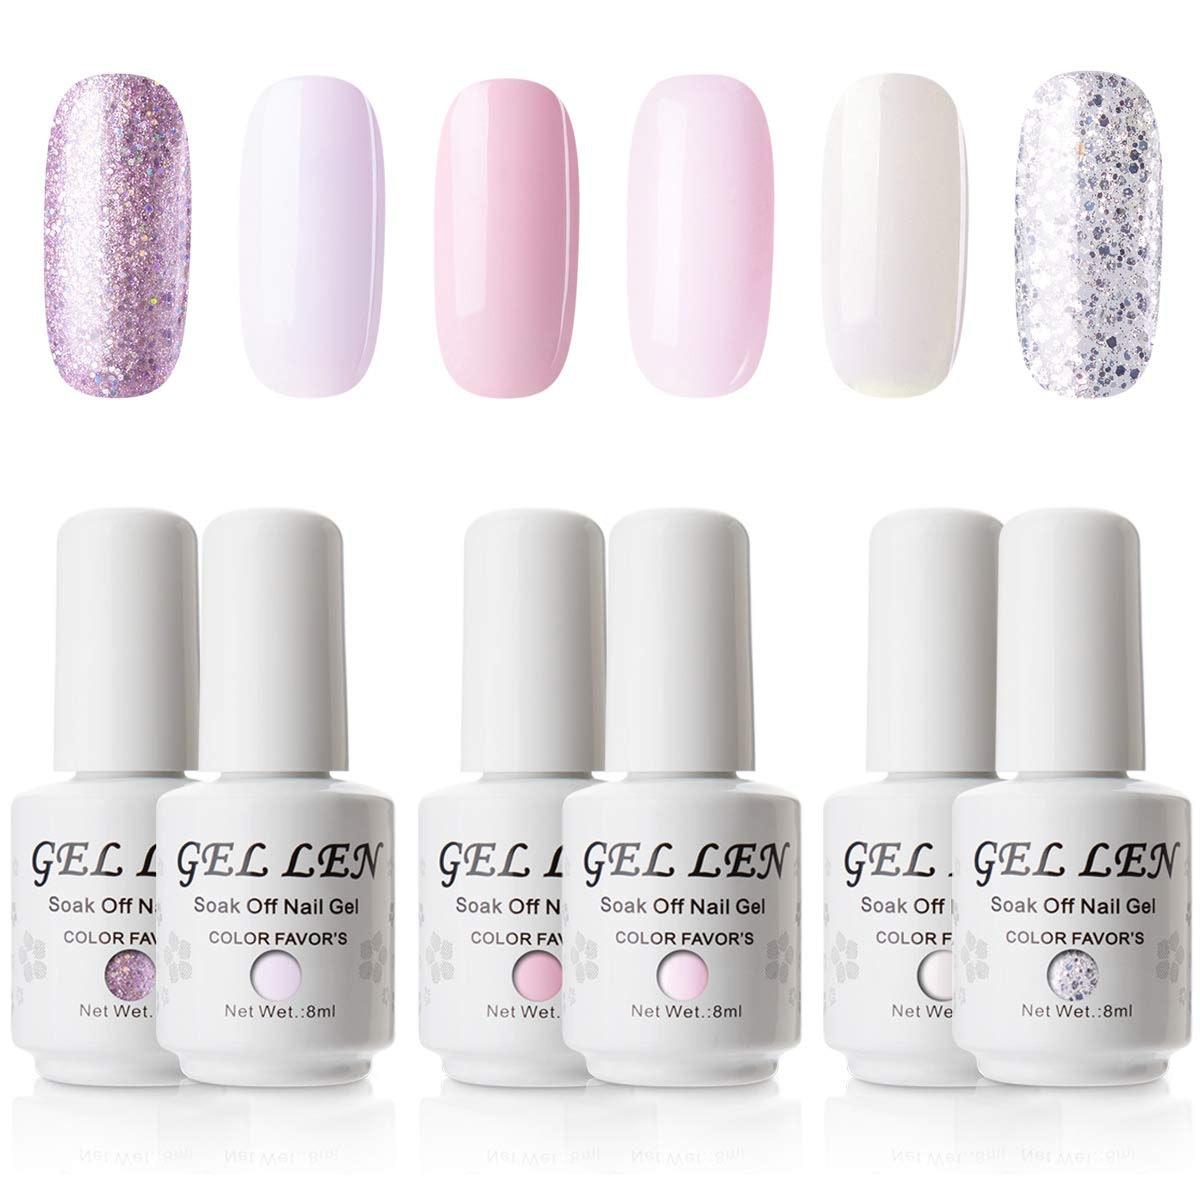 Gellen Gel Nail Polish Set (6-Pack)